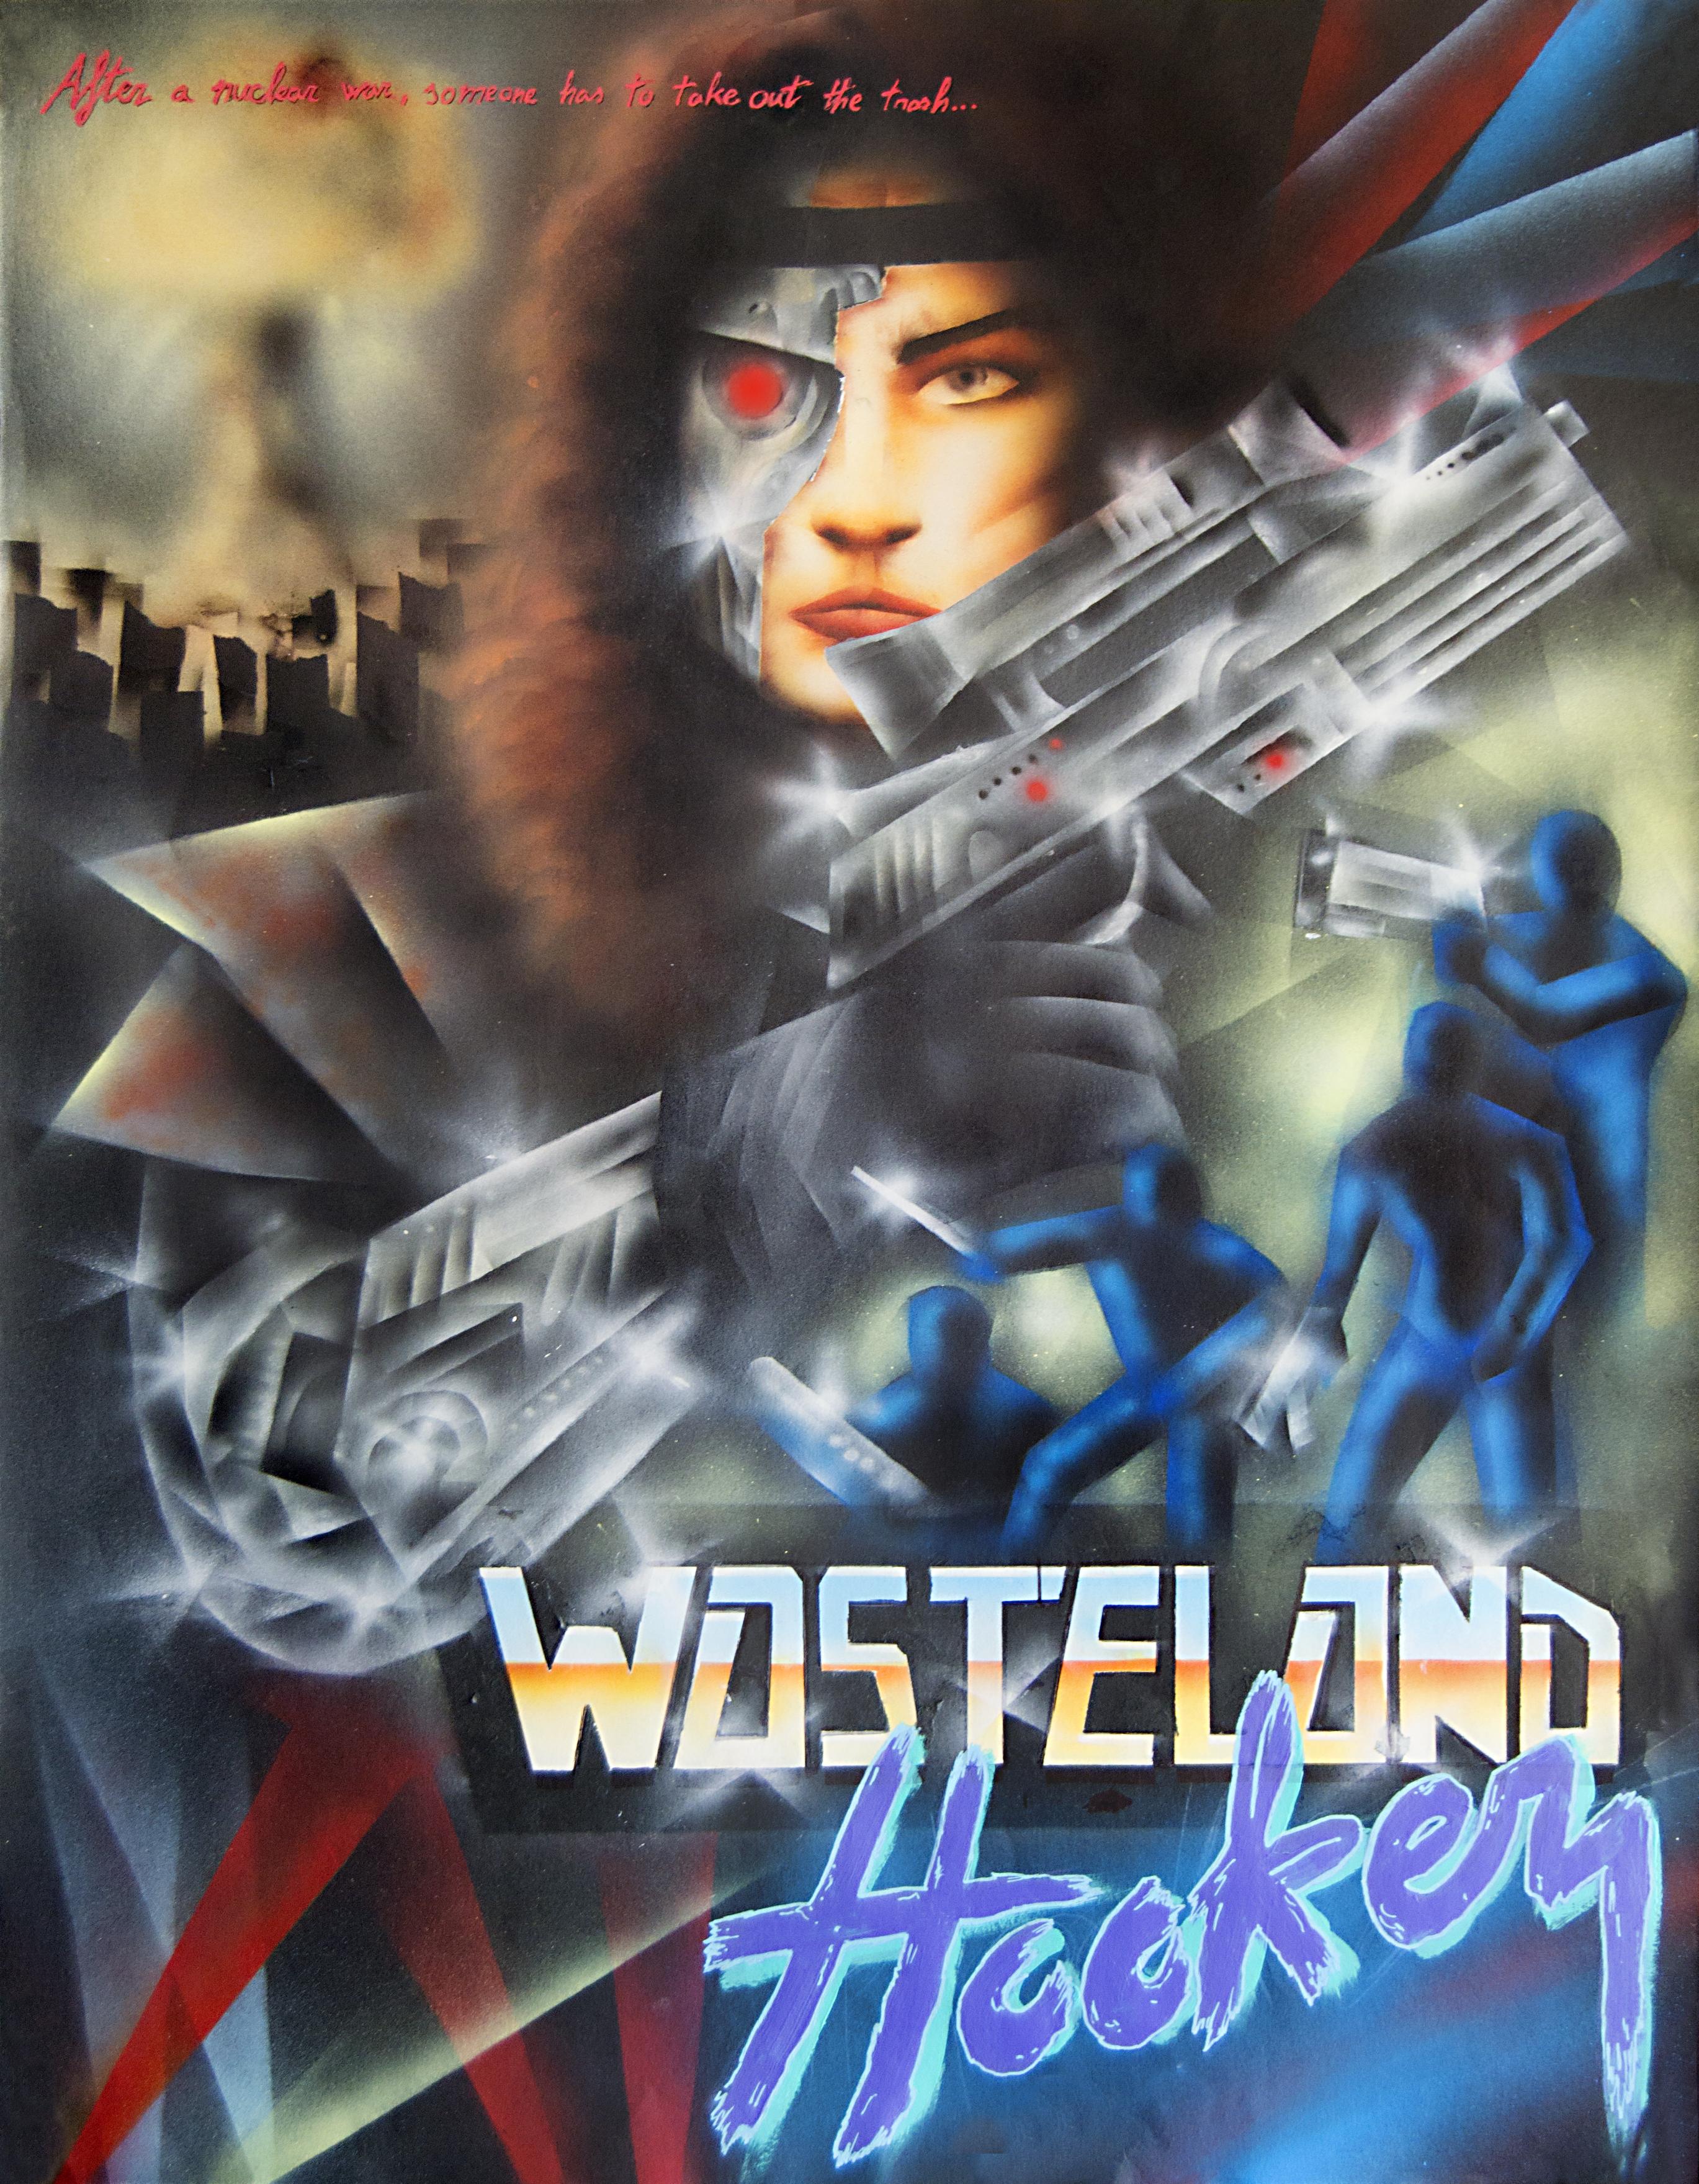 Wasteland Hooker